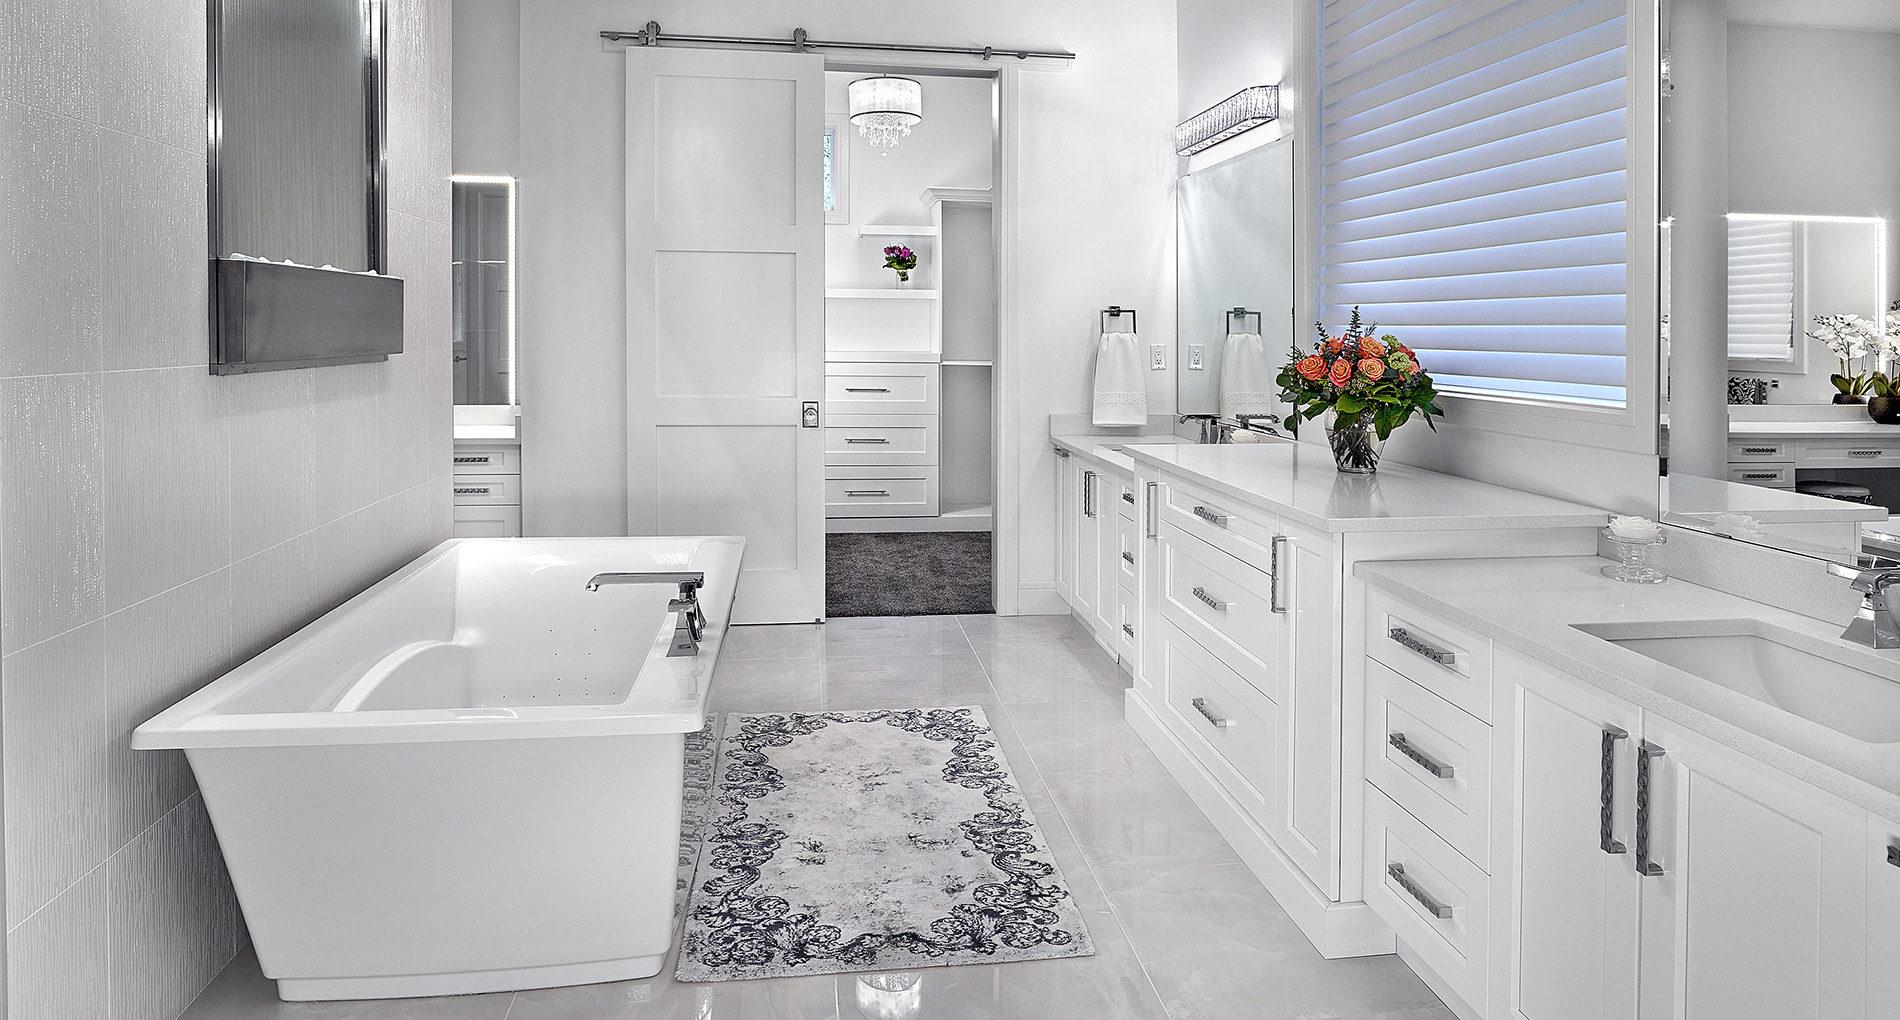 Bathroom Renovation London Scondale Slider